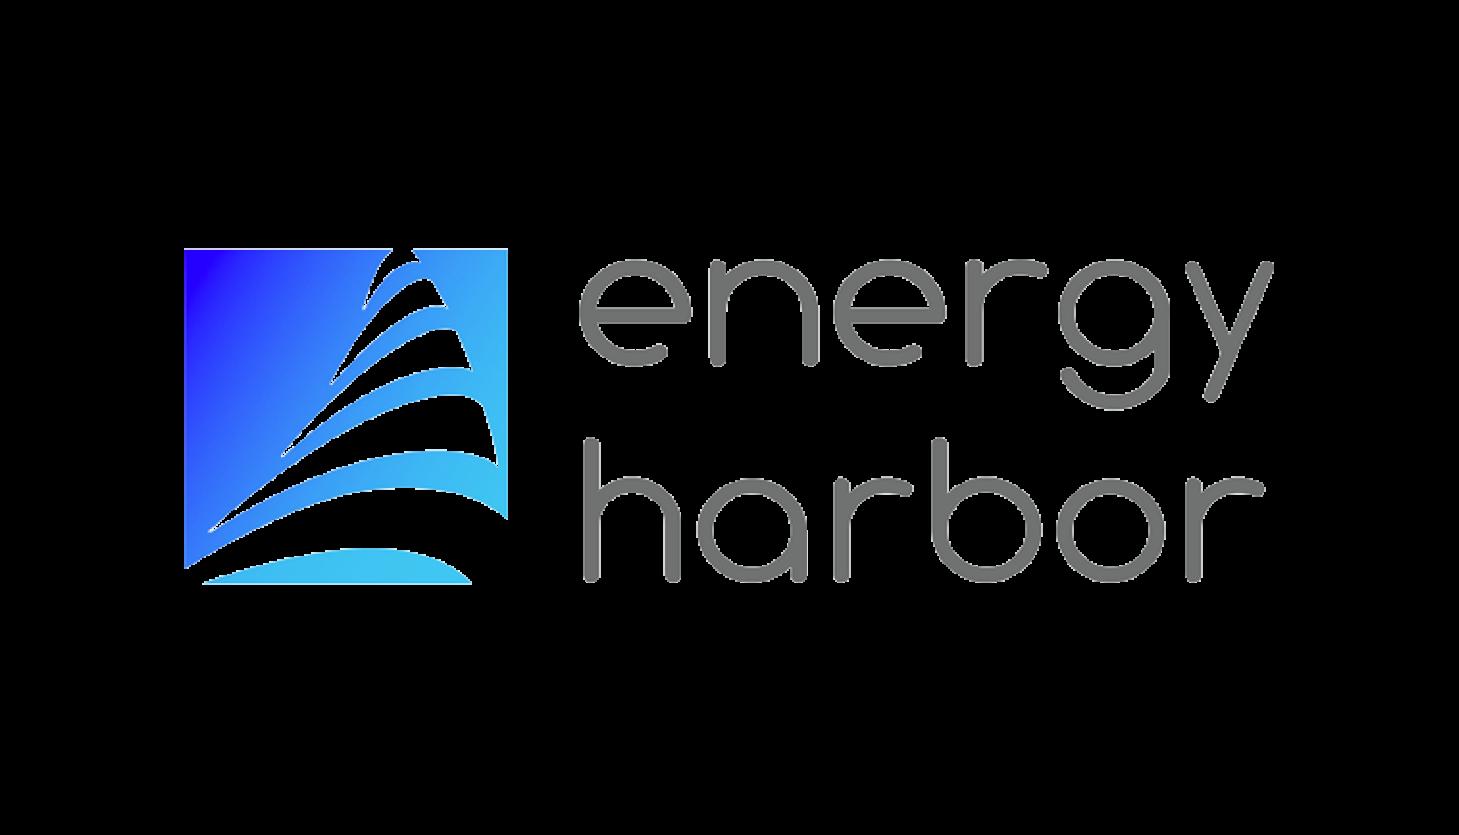 DevonWay-Logos-Scroller-Energy-Harbor